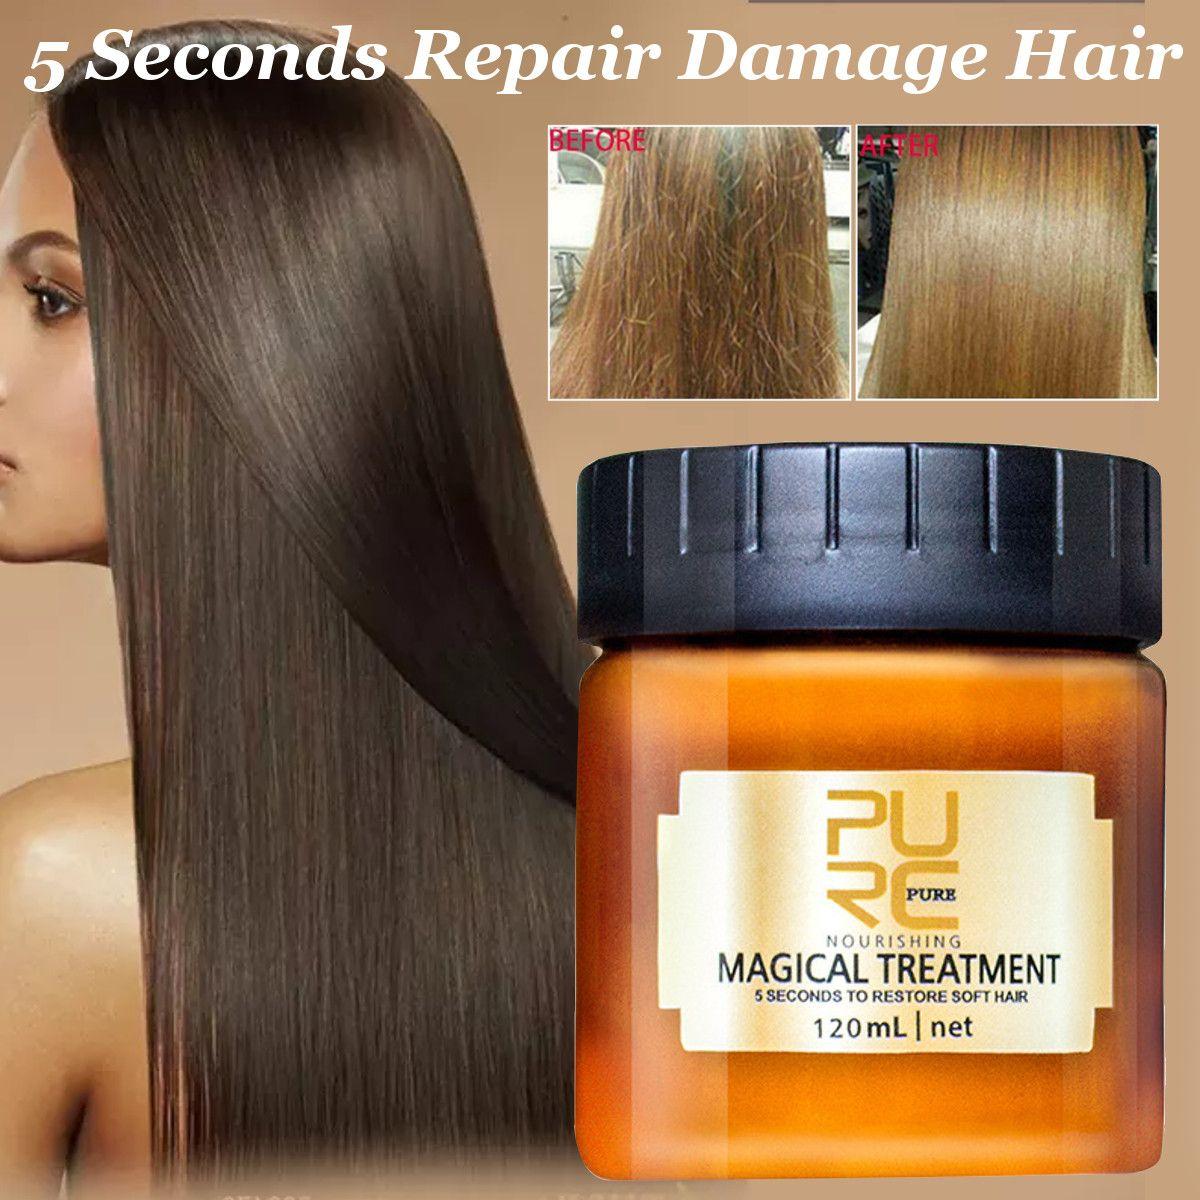 120ml PURC Magical Treatment Hair Mask Nutrition Infusing Masque 5 Seconds Repairs Hair Damage Restore Soft Hair Free Shipping